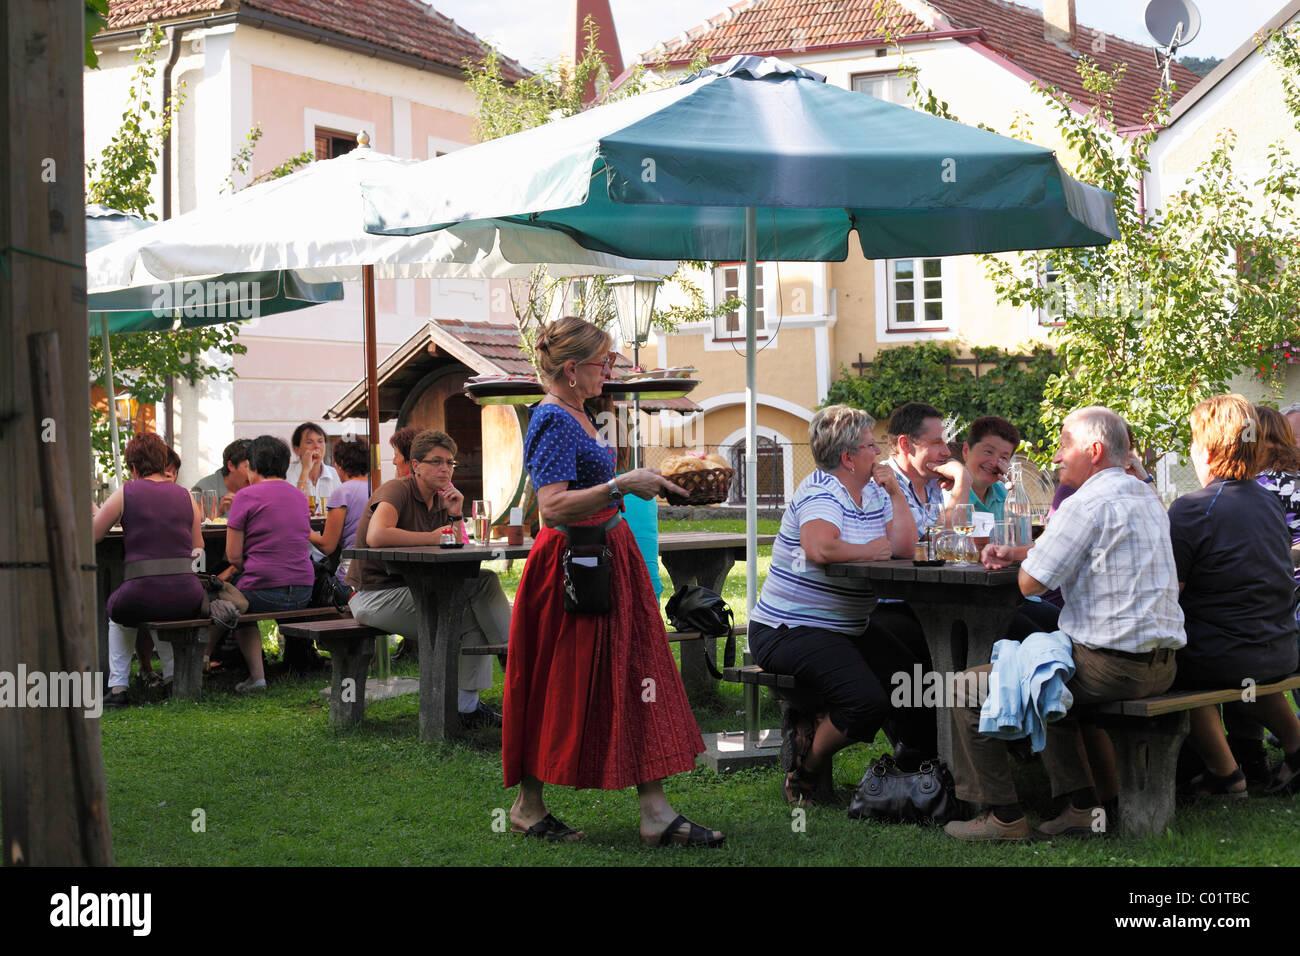 Stagionale Noiblinger taverna, Weissenkirchen nella valle di Wachau, regione Waldviertel, Austria Inferiore, Austria, Immagini Stock